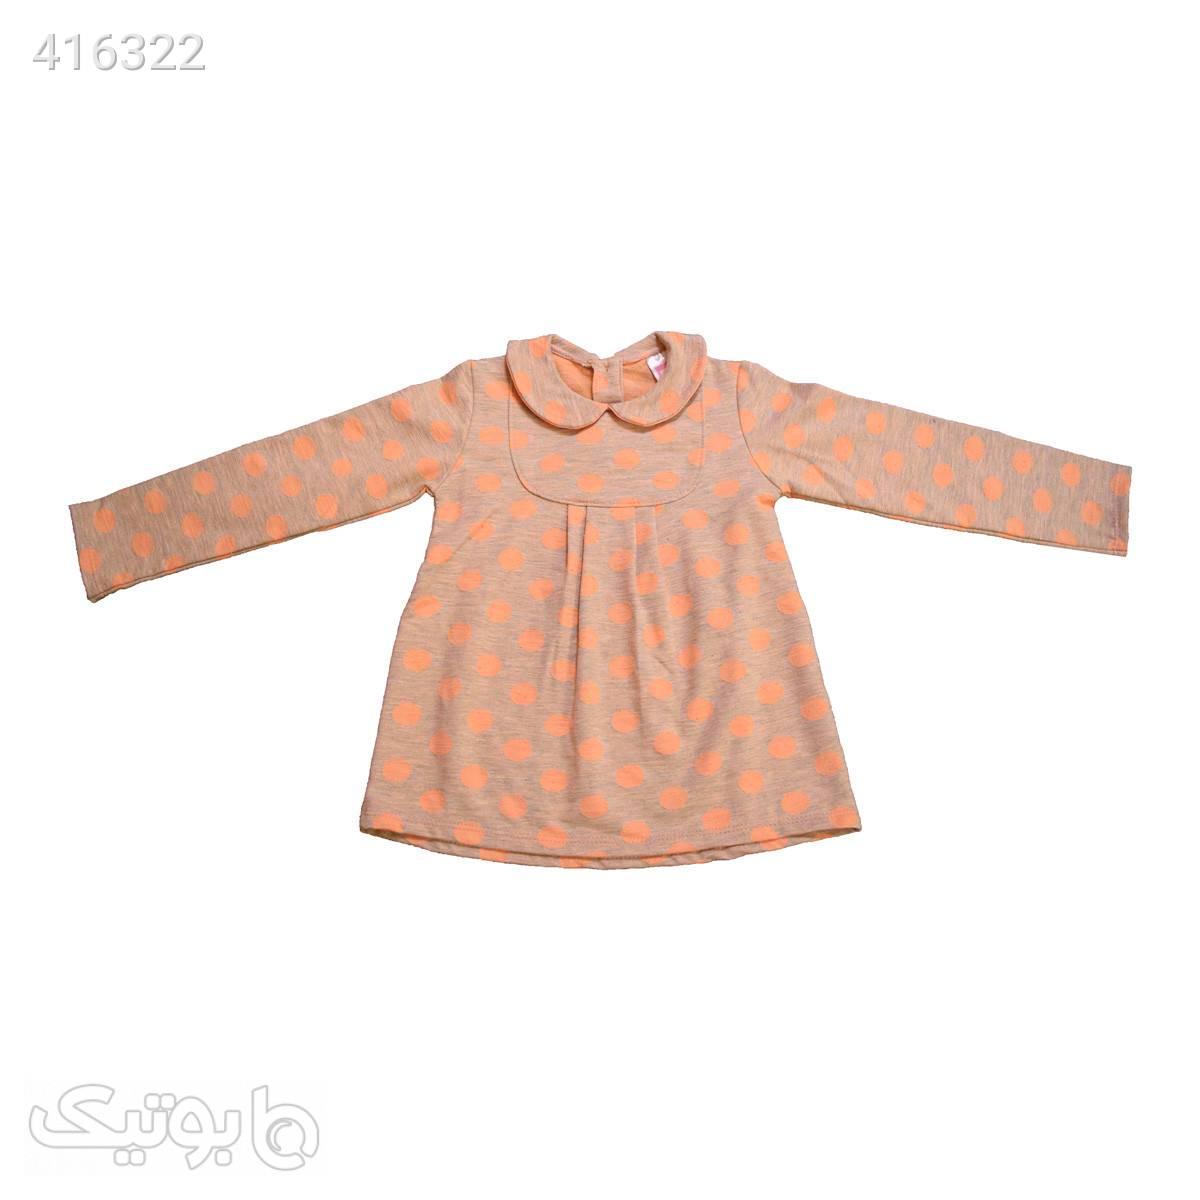 لباس کودک ضدلک هاینو - طرح آنیتا نارنجی نارنجی لباس کودک دخترانه